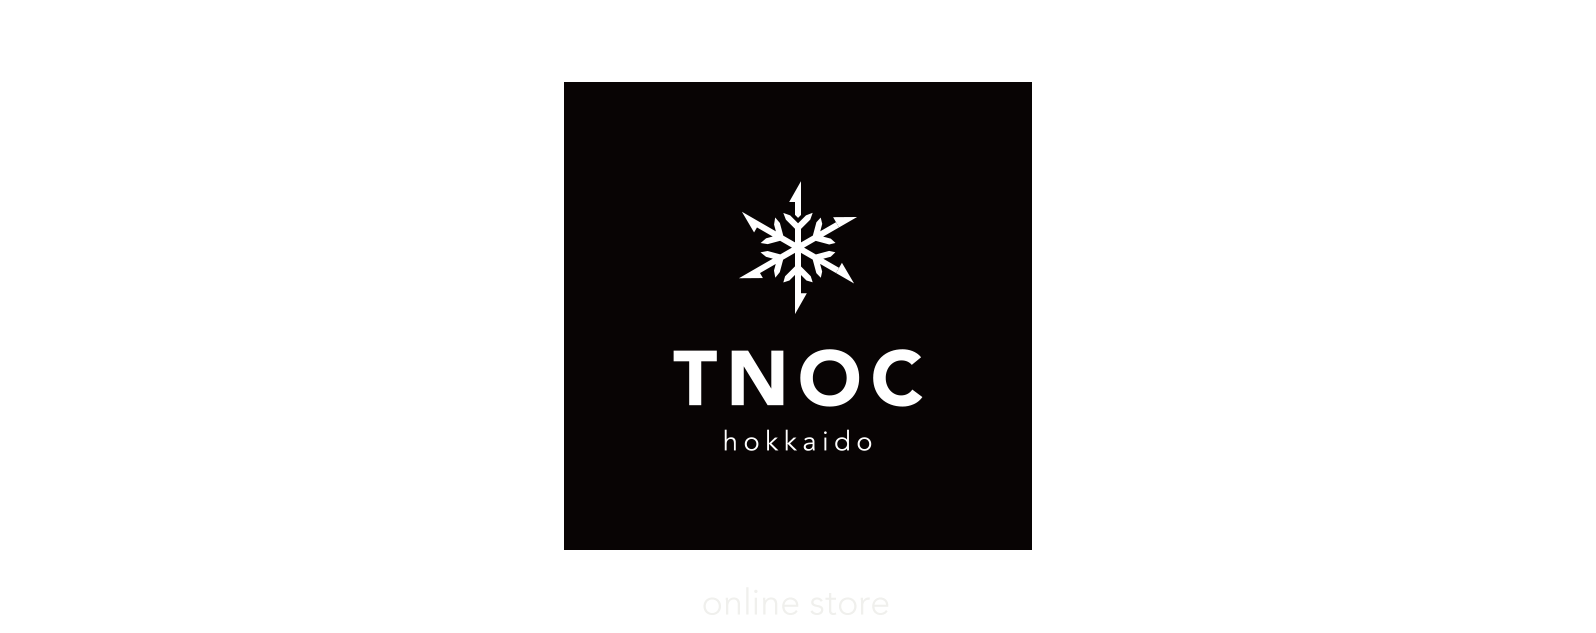 TNOC オンラインストア